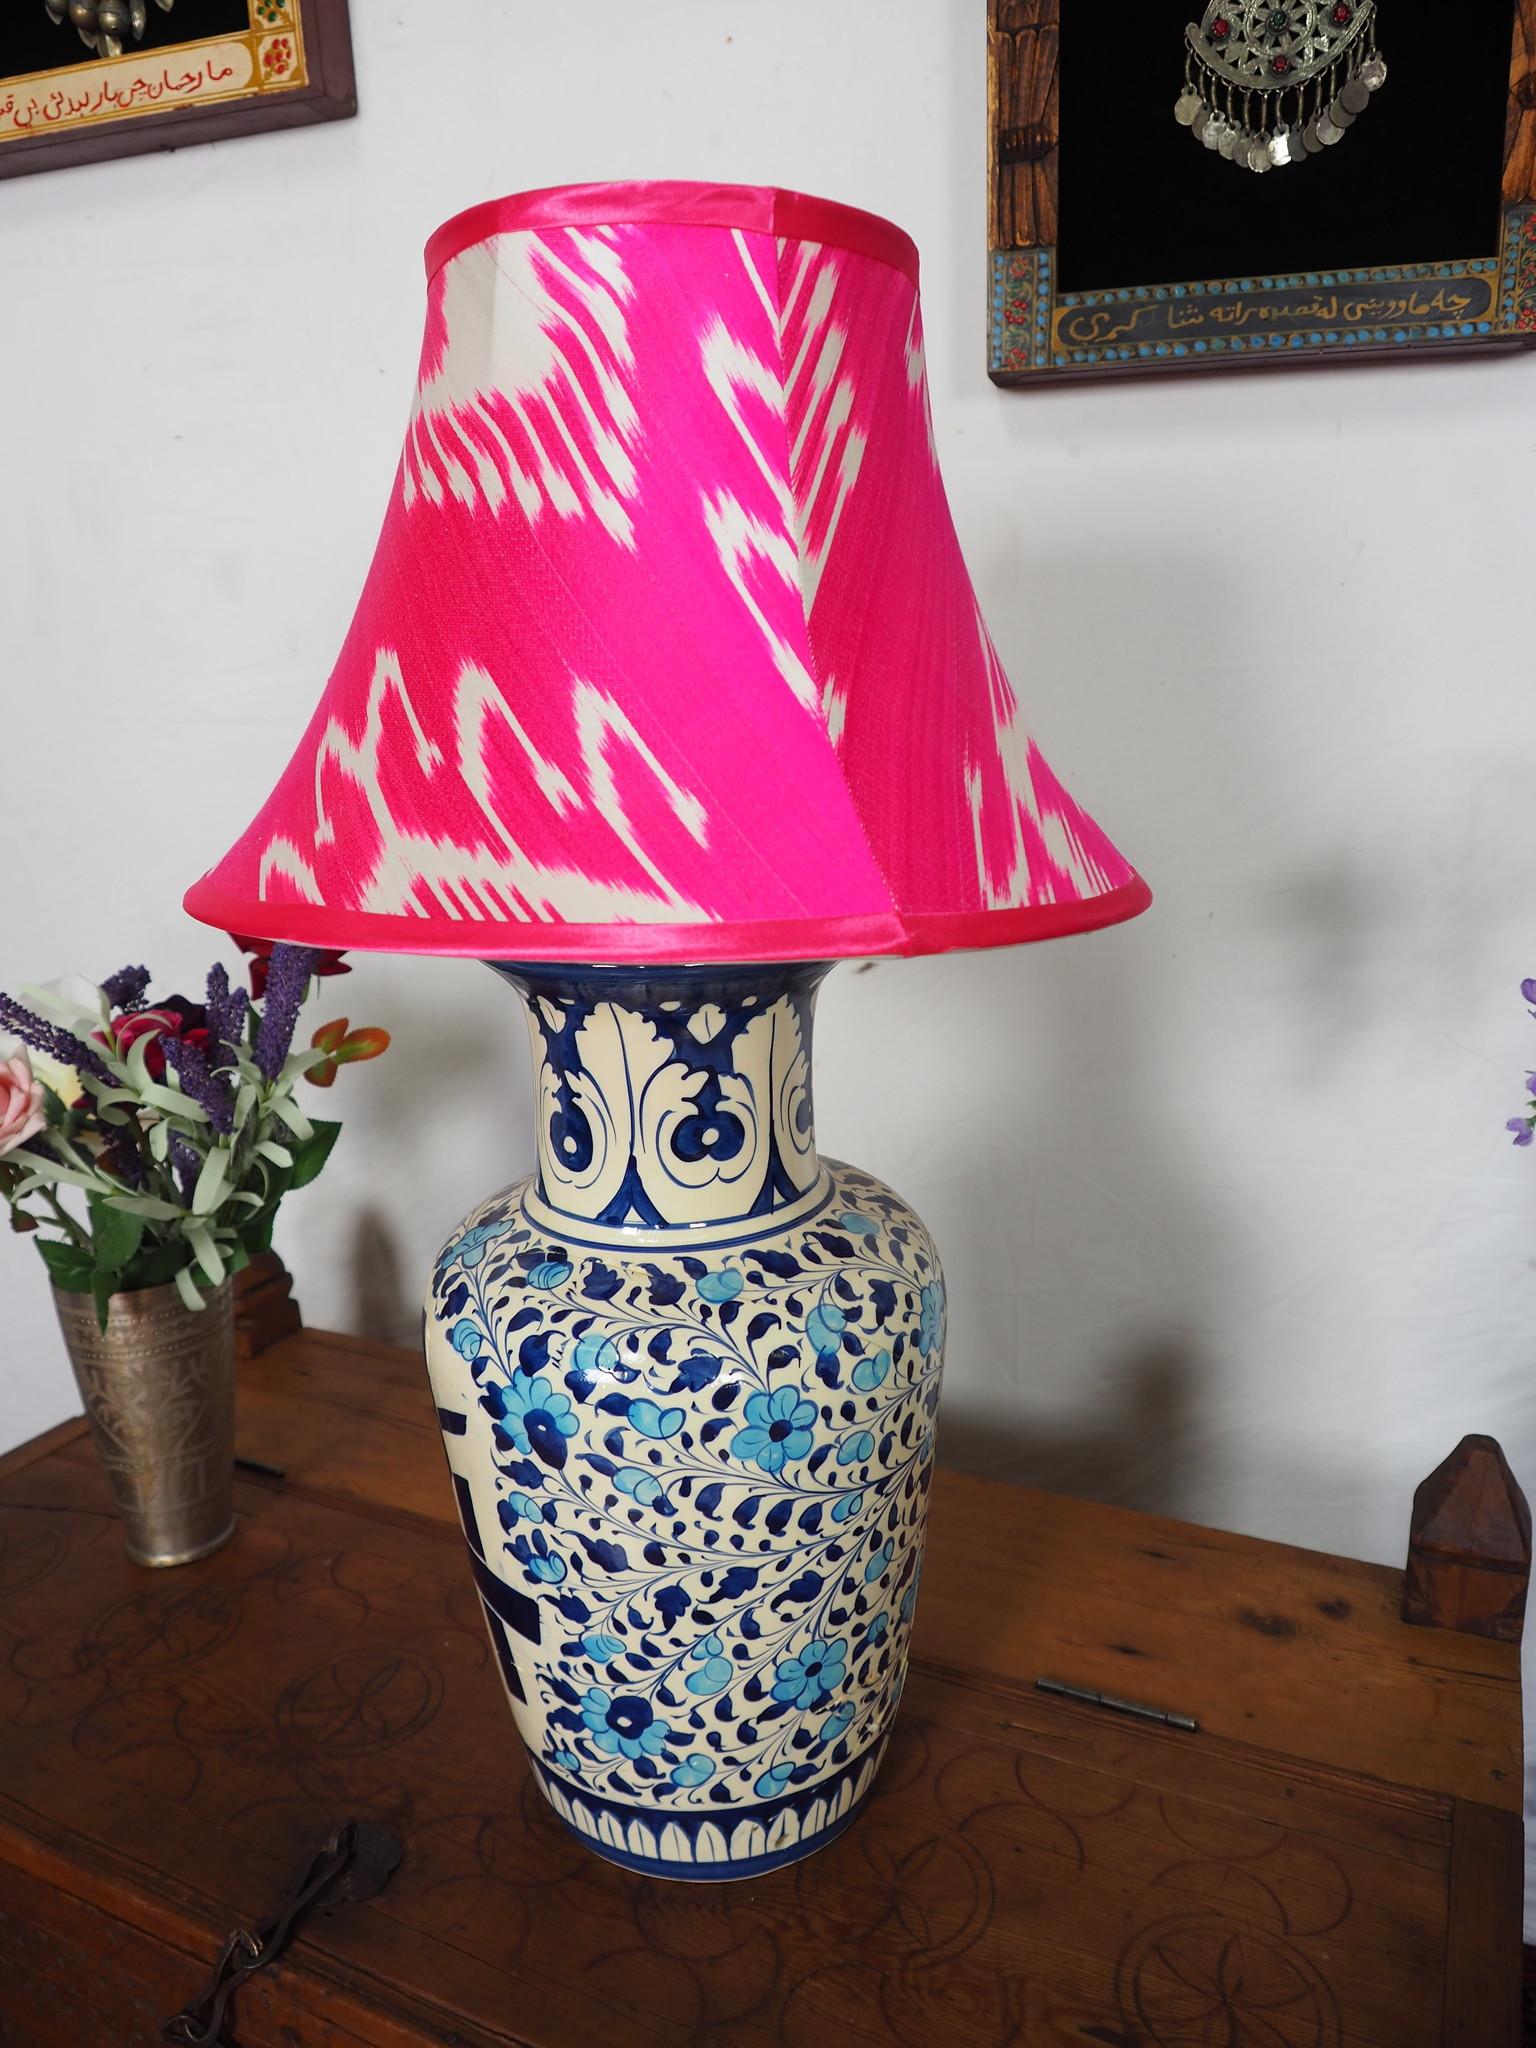 extravagant orient Uzbek Ikat stoff Schirm Lampenschirm Leuchtenschirm lampshade Nr:A